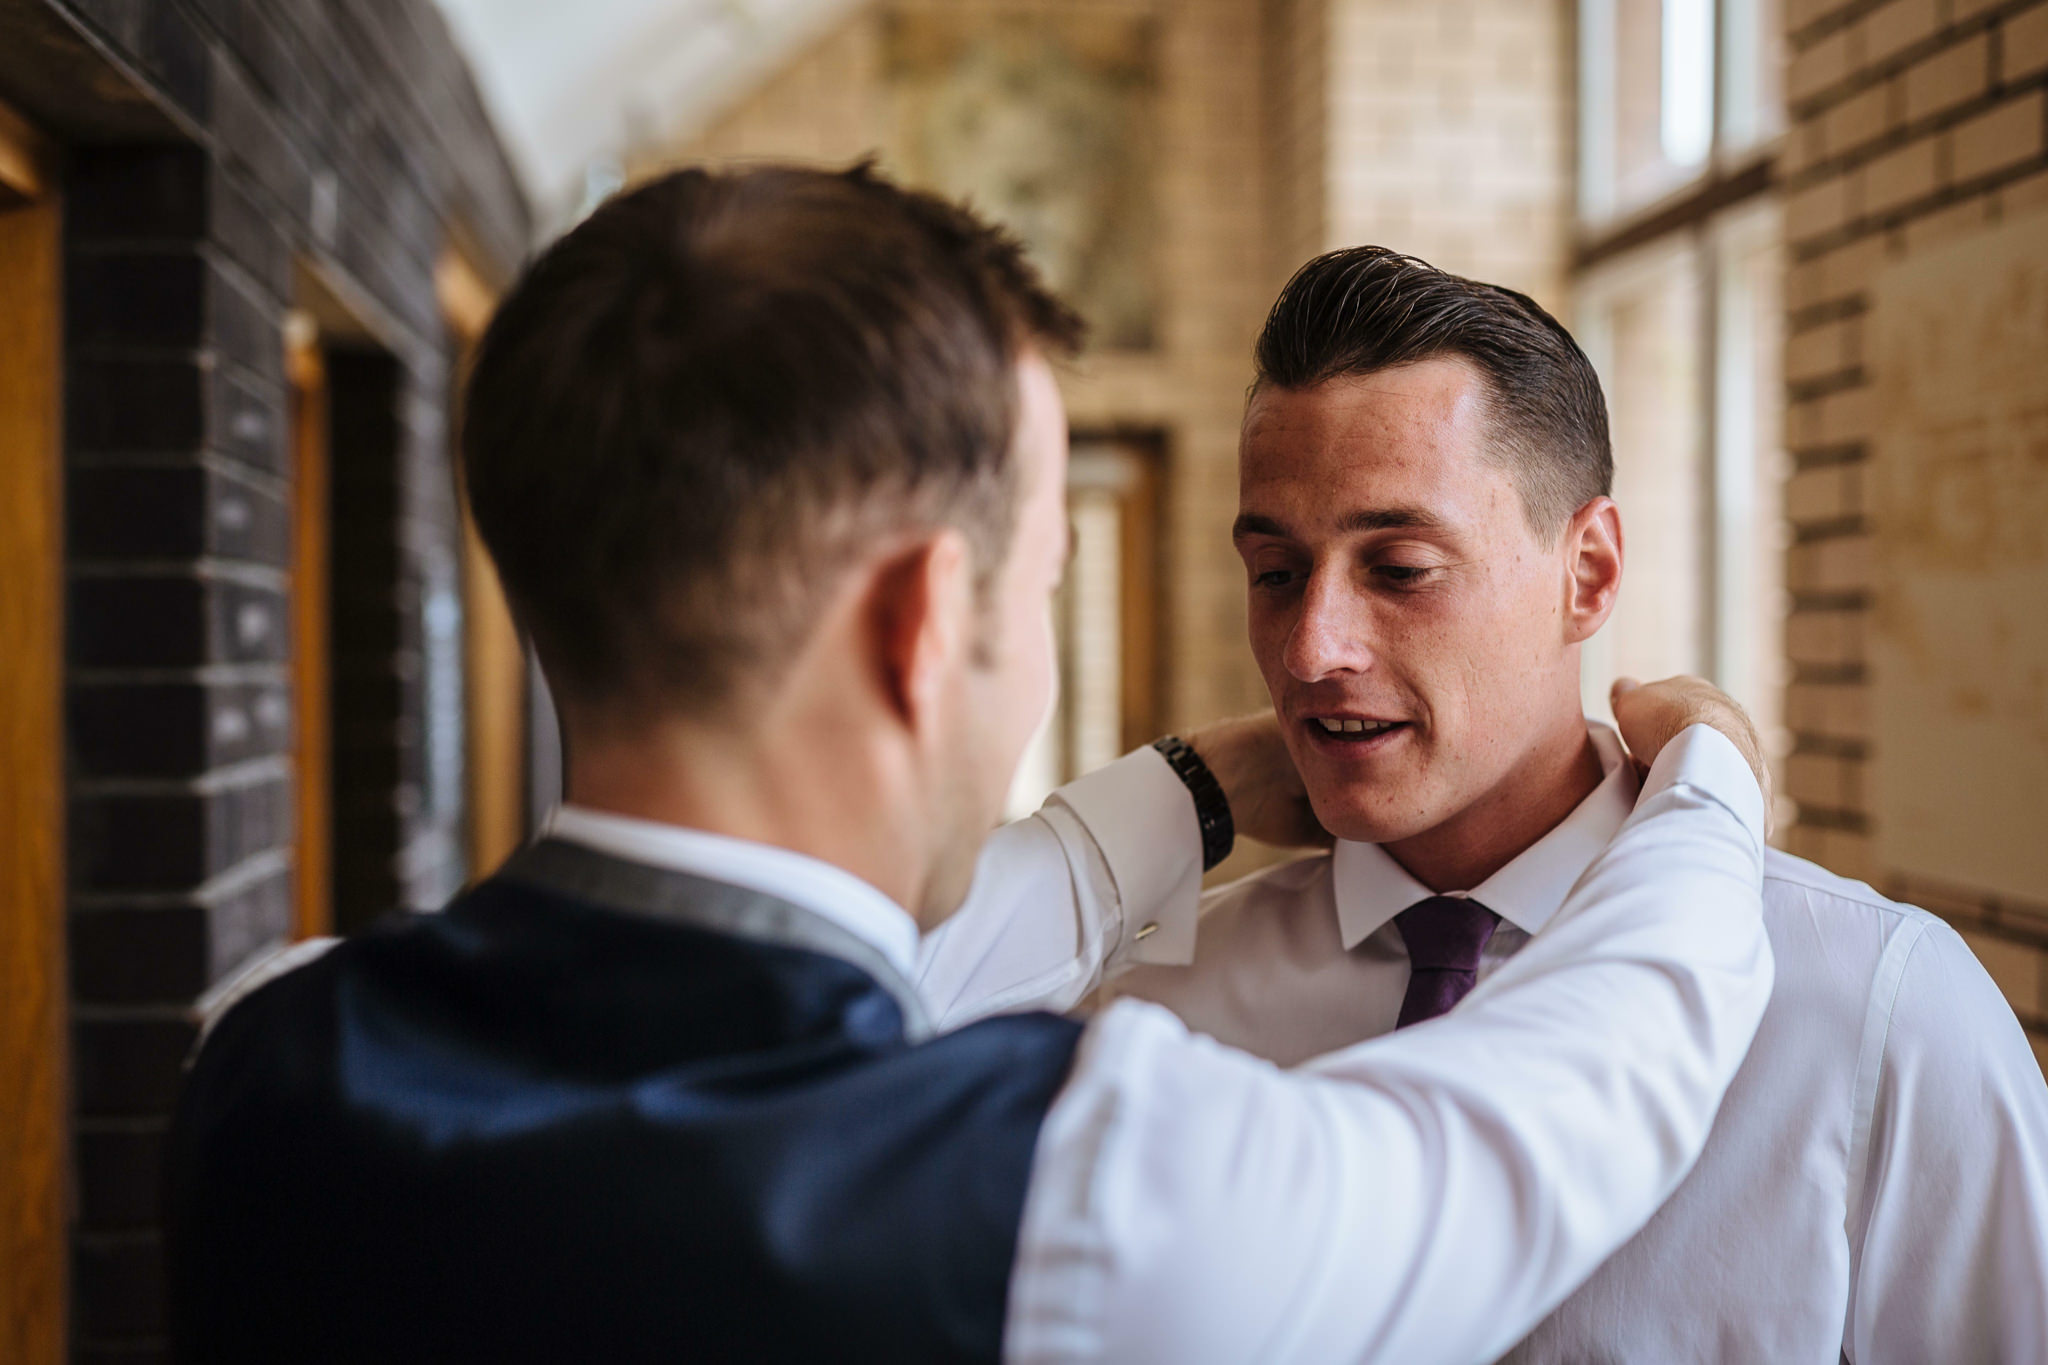 paul-marbrook-Caer-Llan-Wedding-Photographer-90026